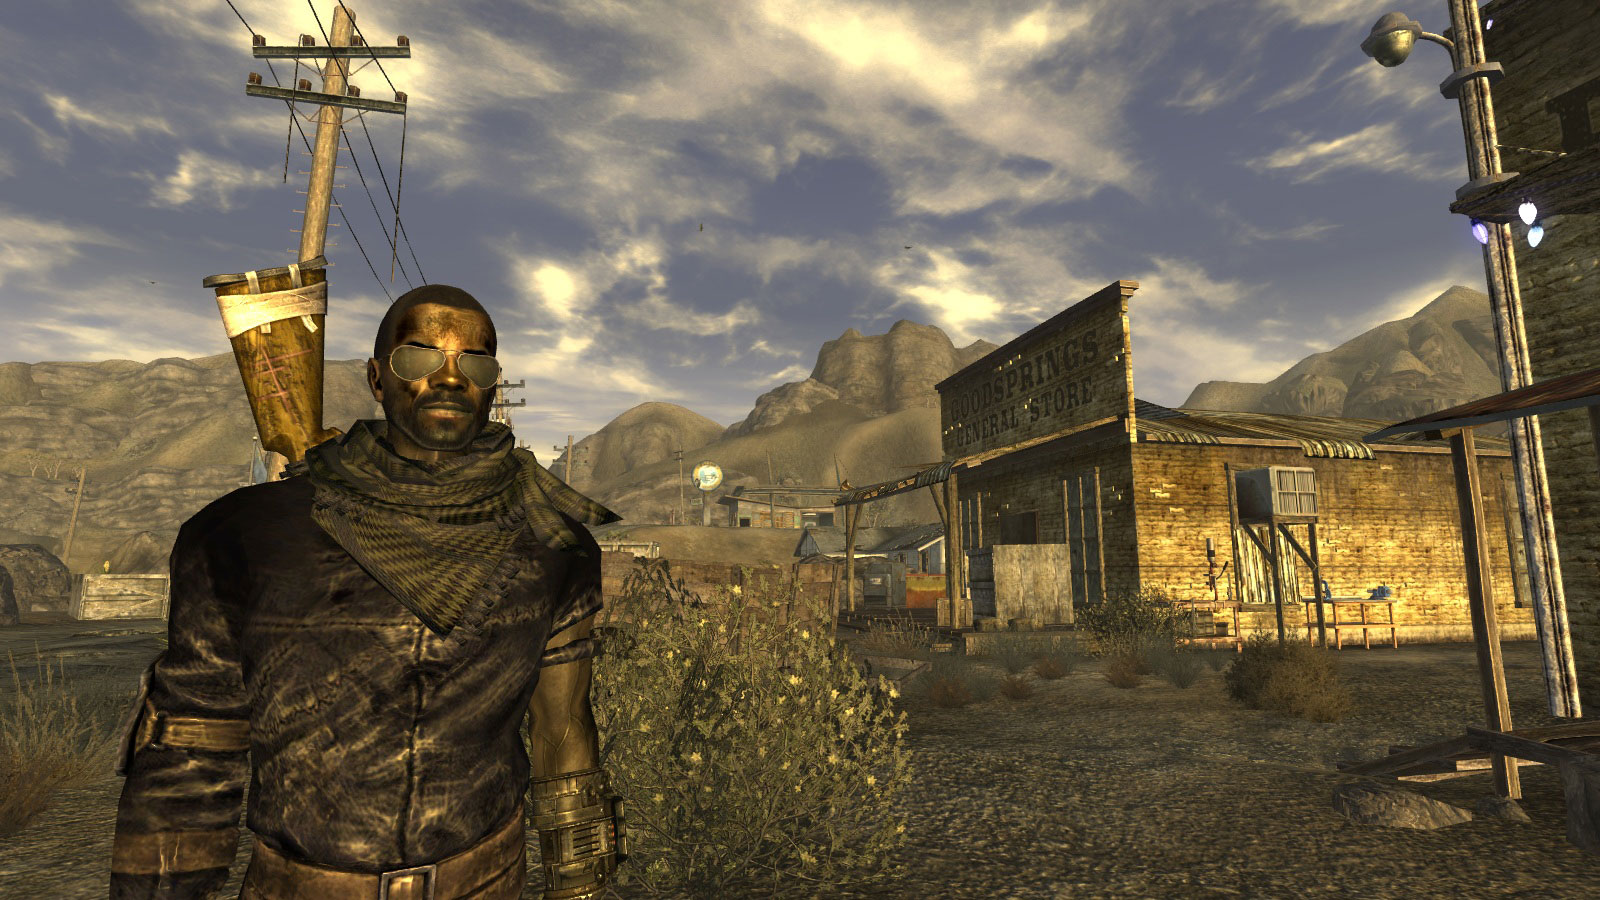 Лучшие моды | Wasteland Chronicles - Все о